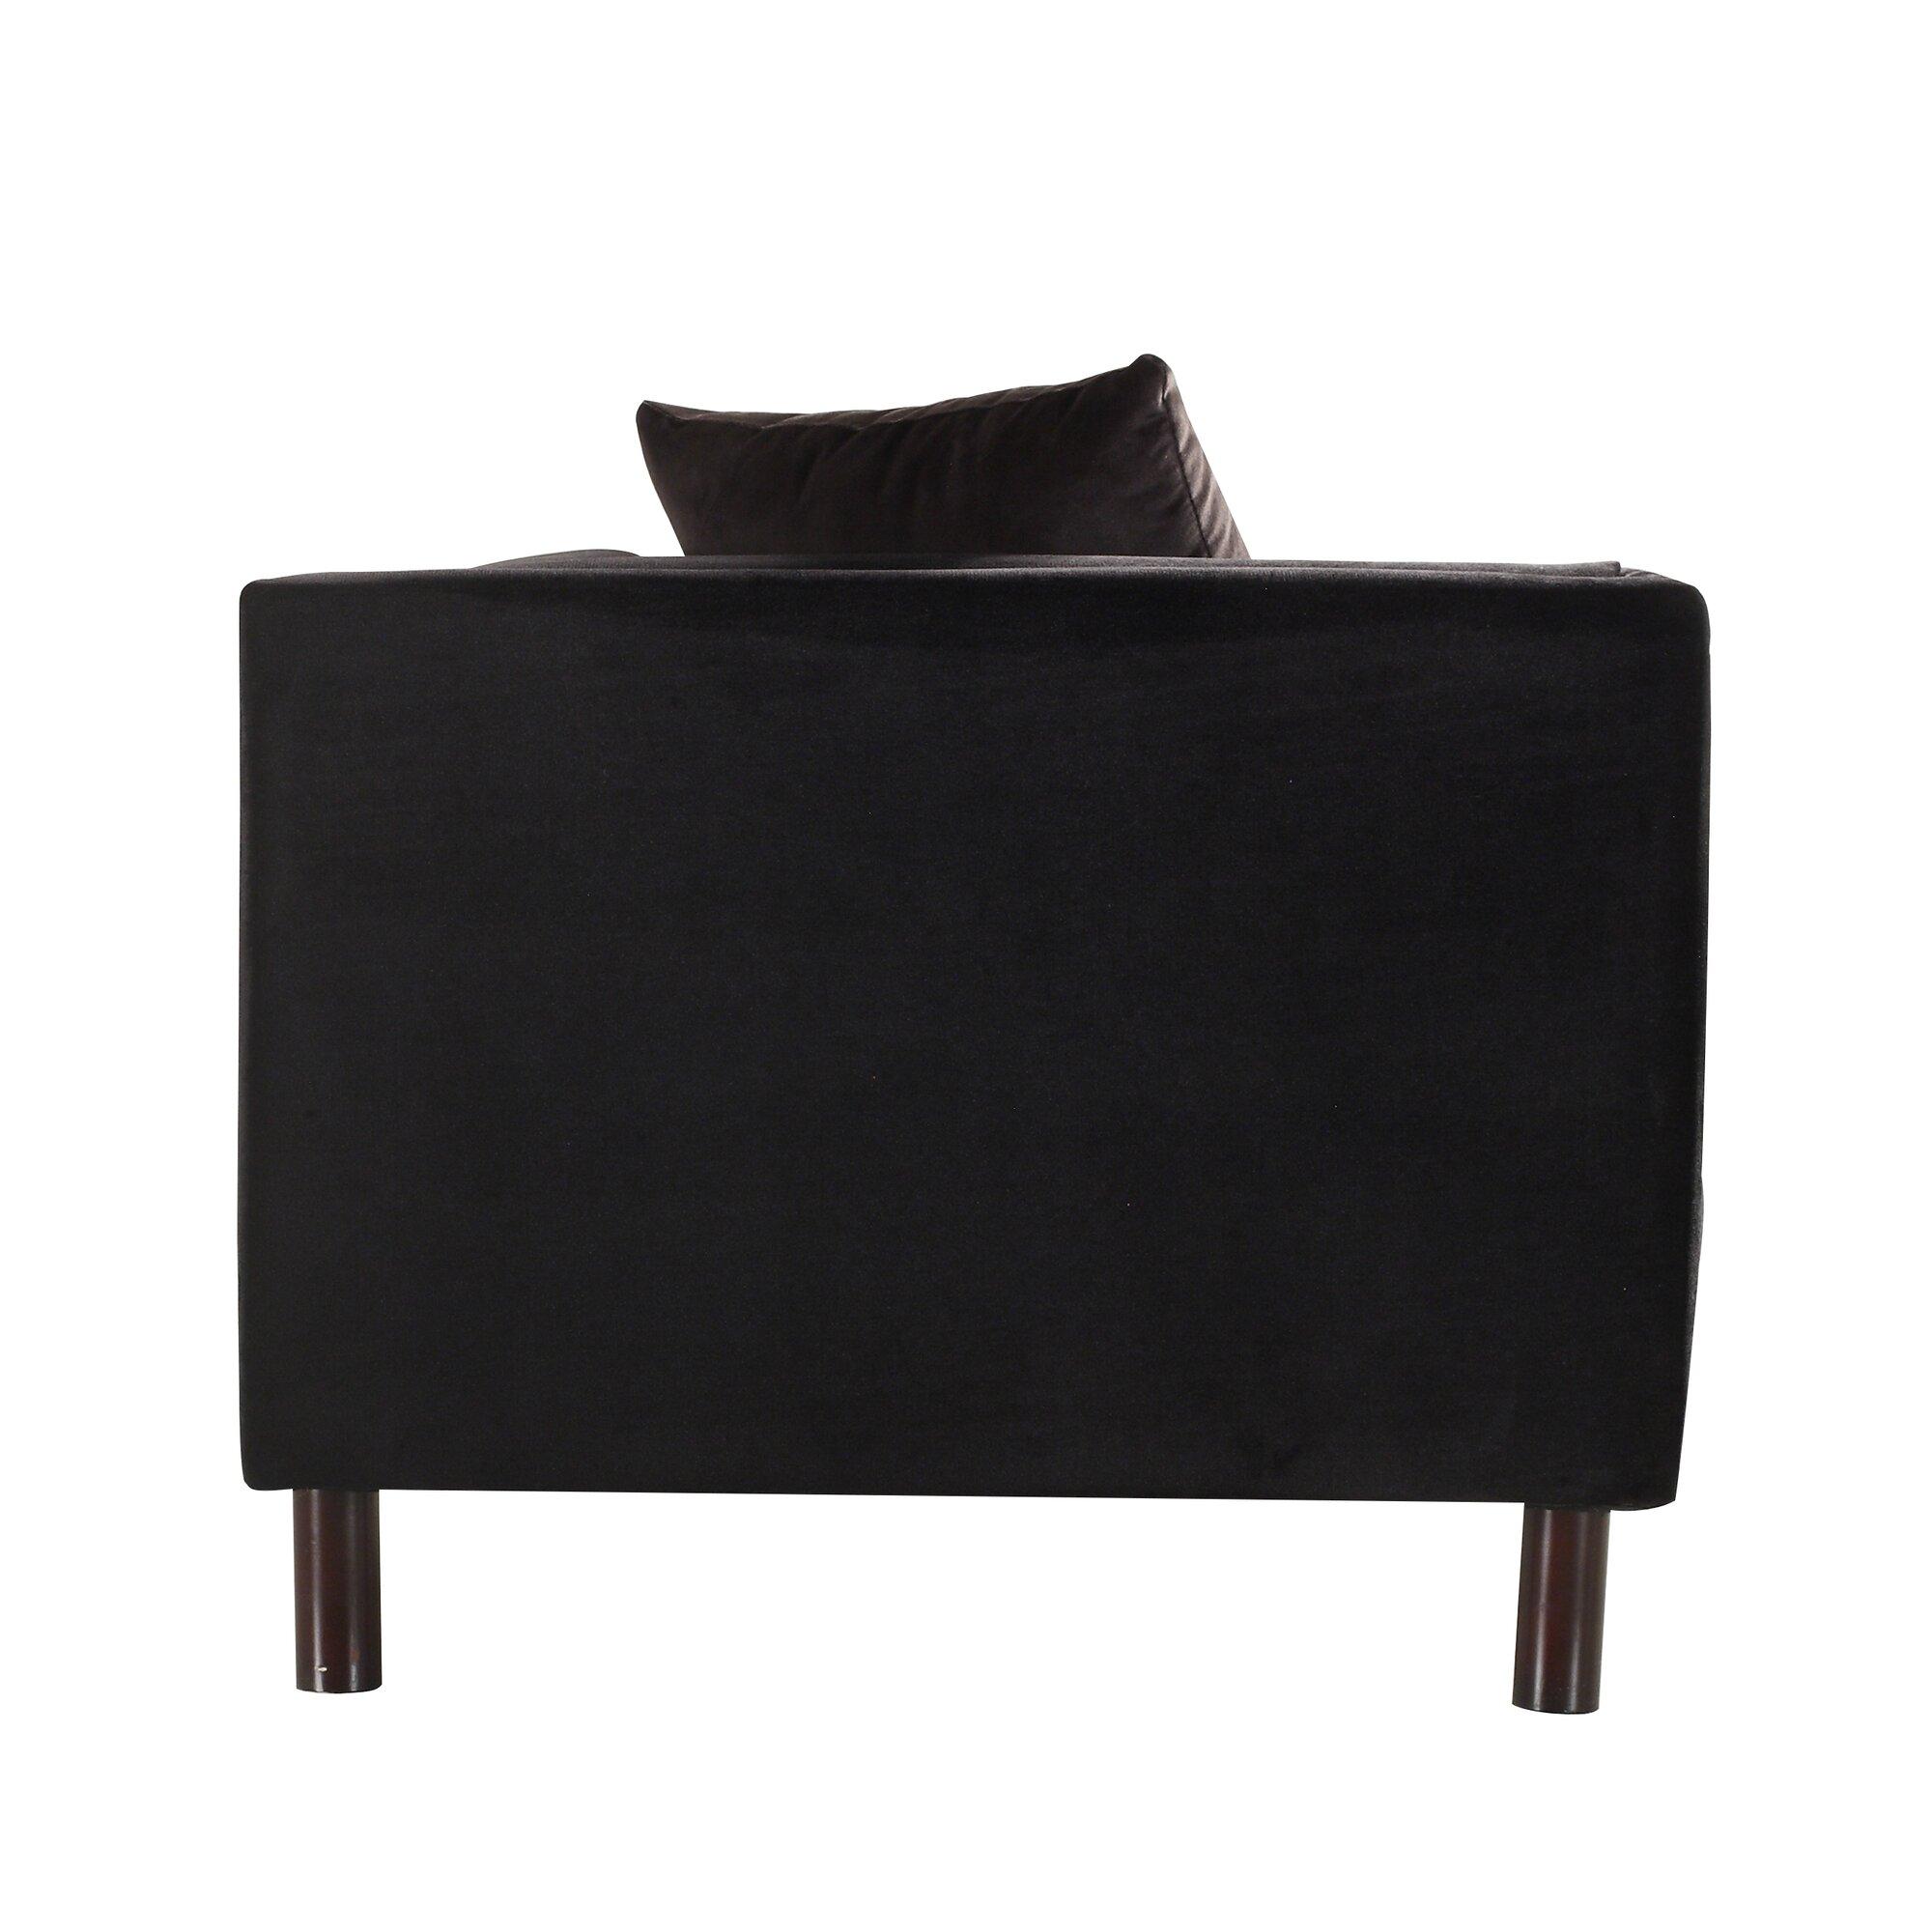 mid century modern sofa reviews allmodern. Black Bedroom Furniture Sets. Home Design Ideas